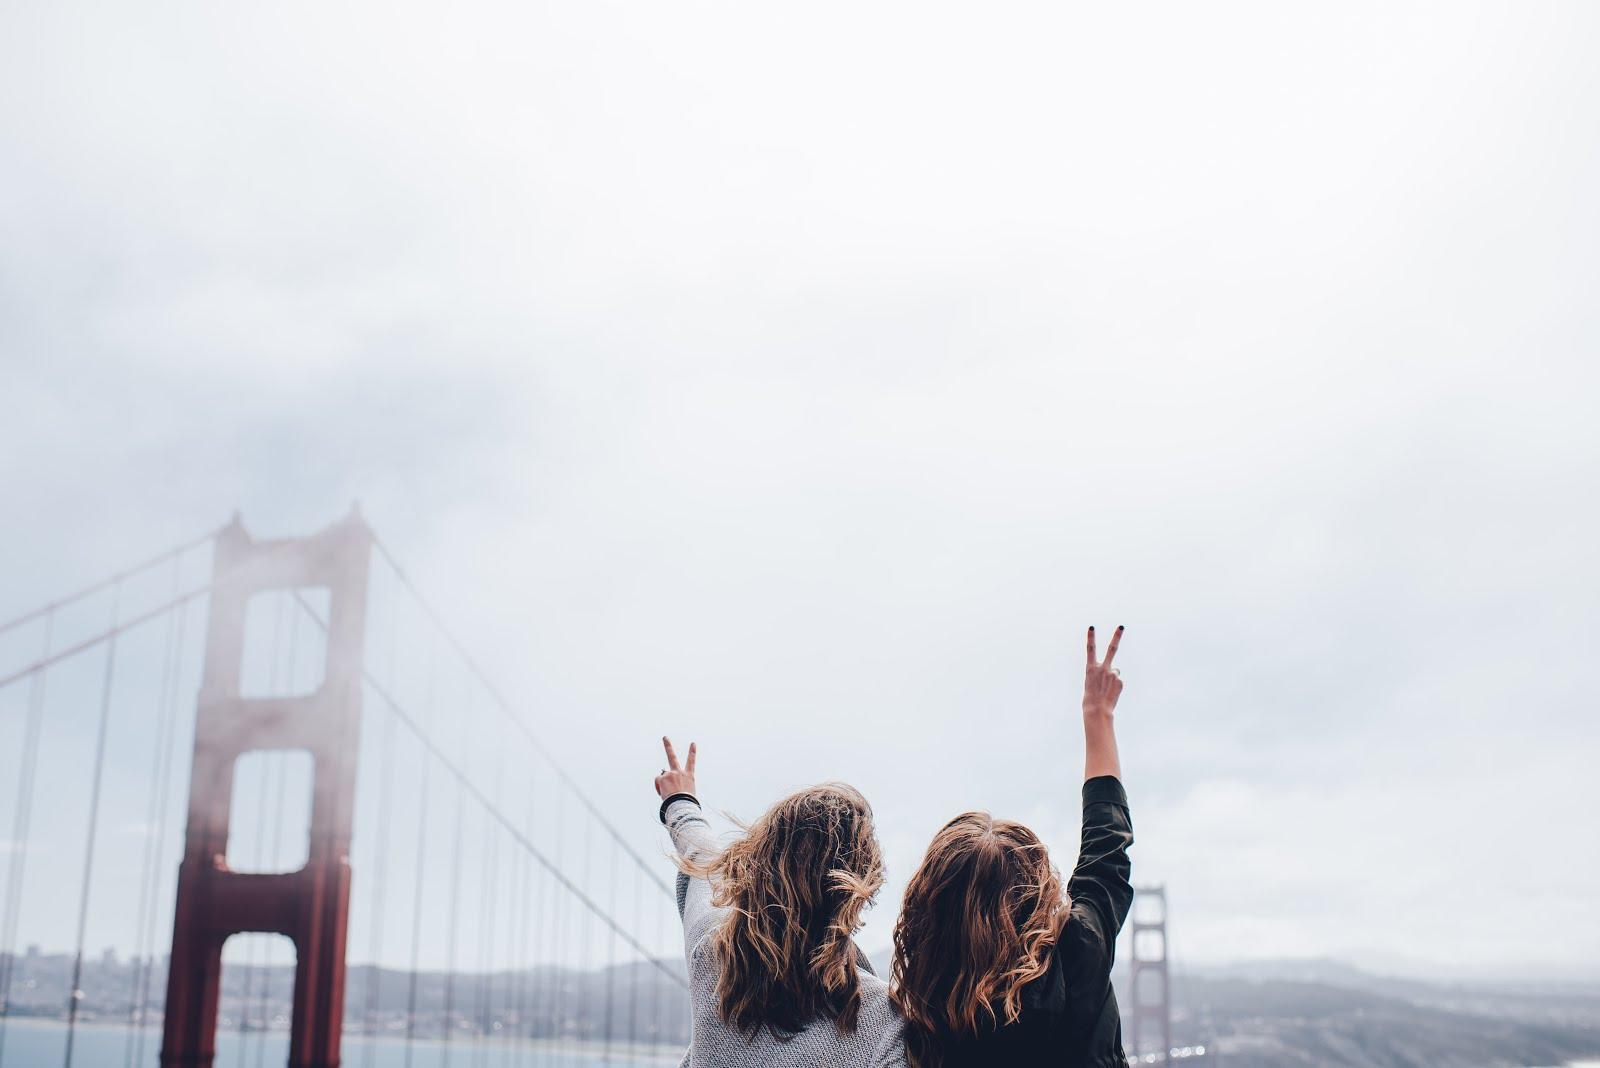 Mujeres Viajeras Instagram